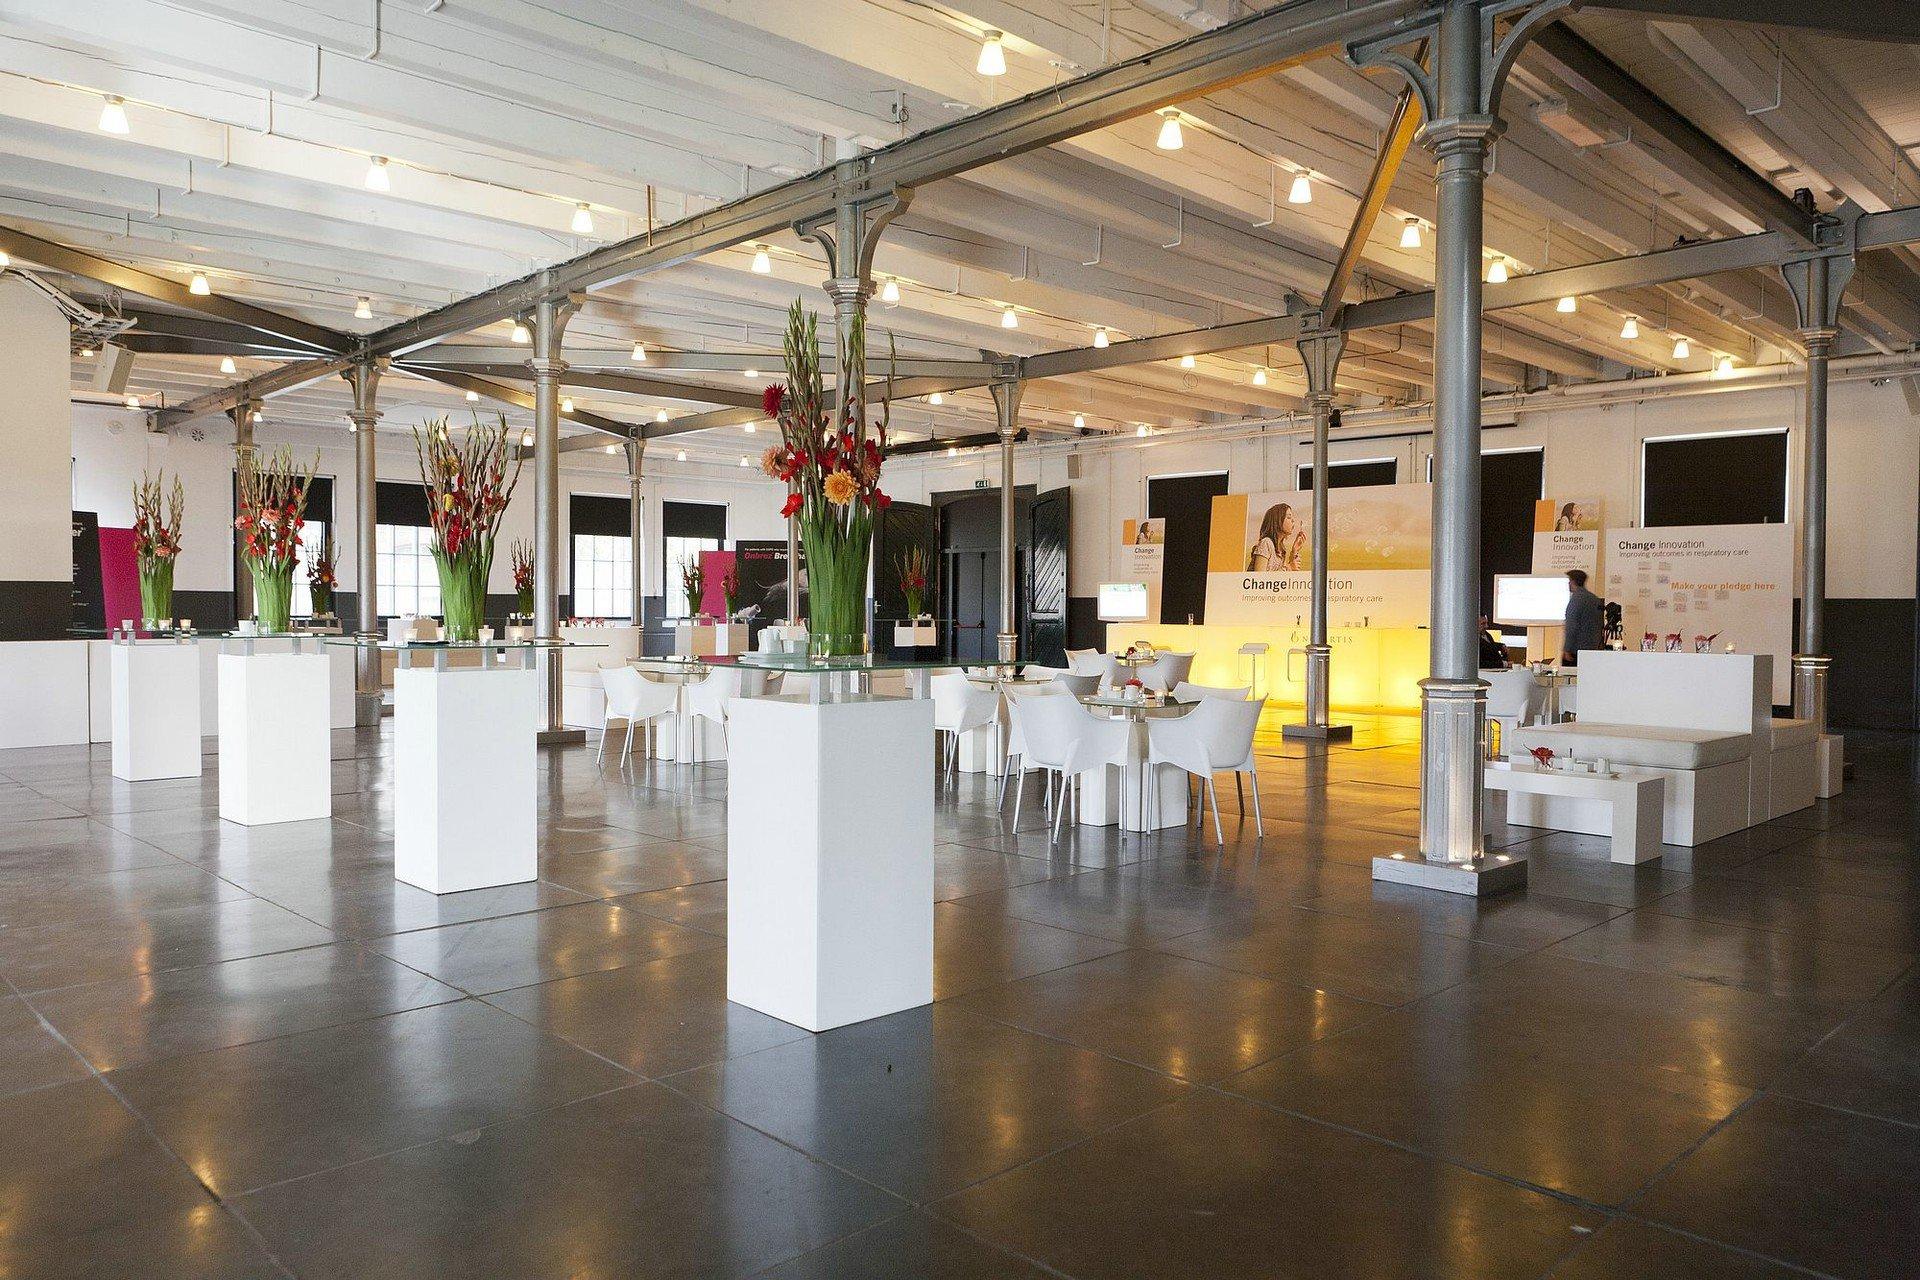 Amsterdam corporate event venues Lieu industriel Taets Art and Event Park image 41